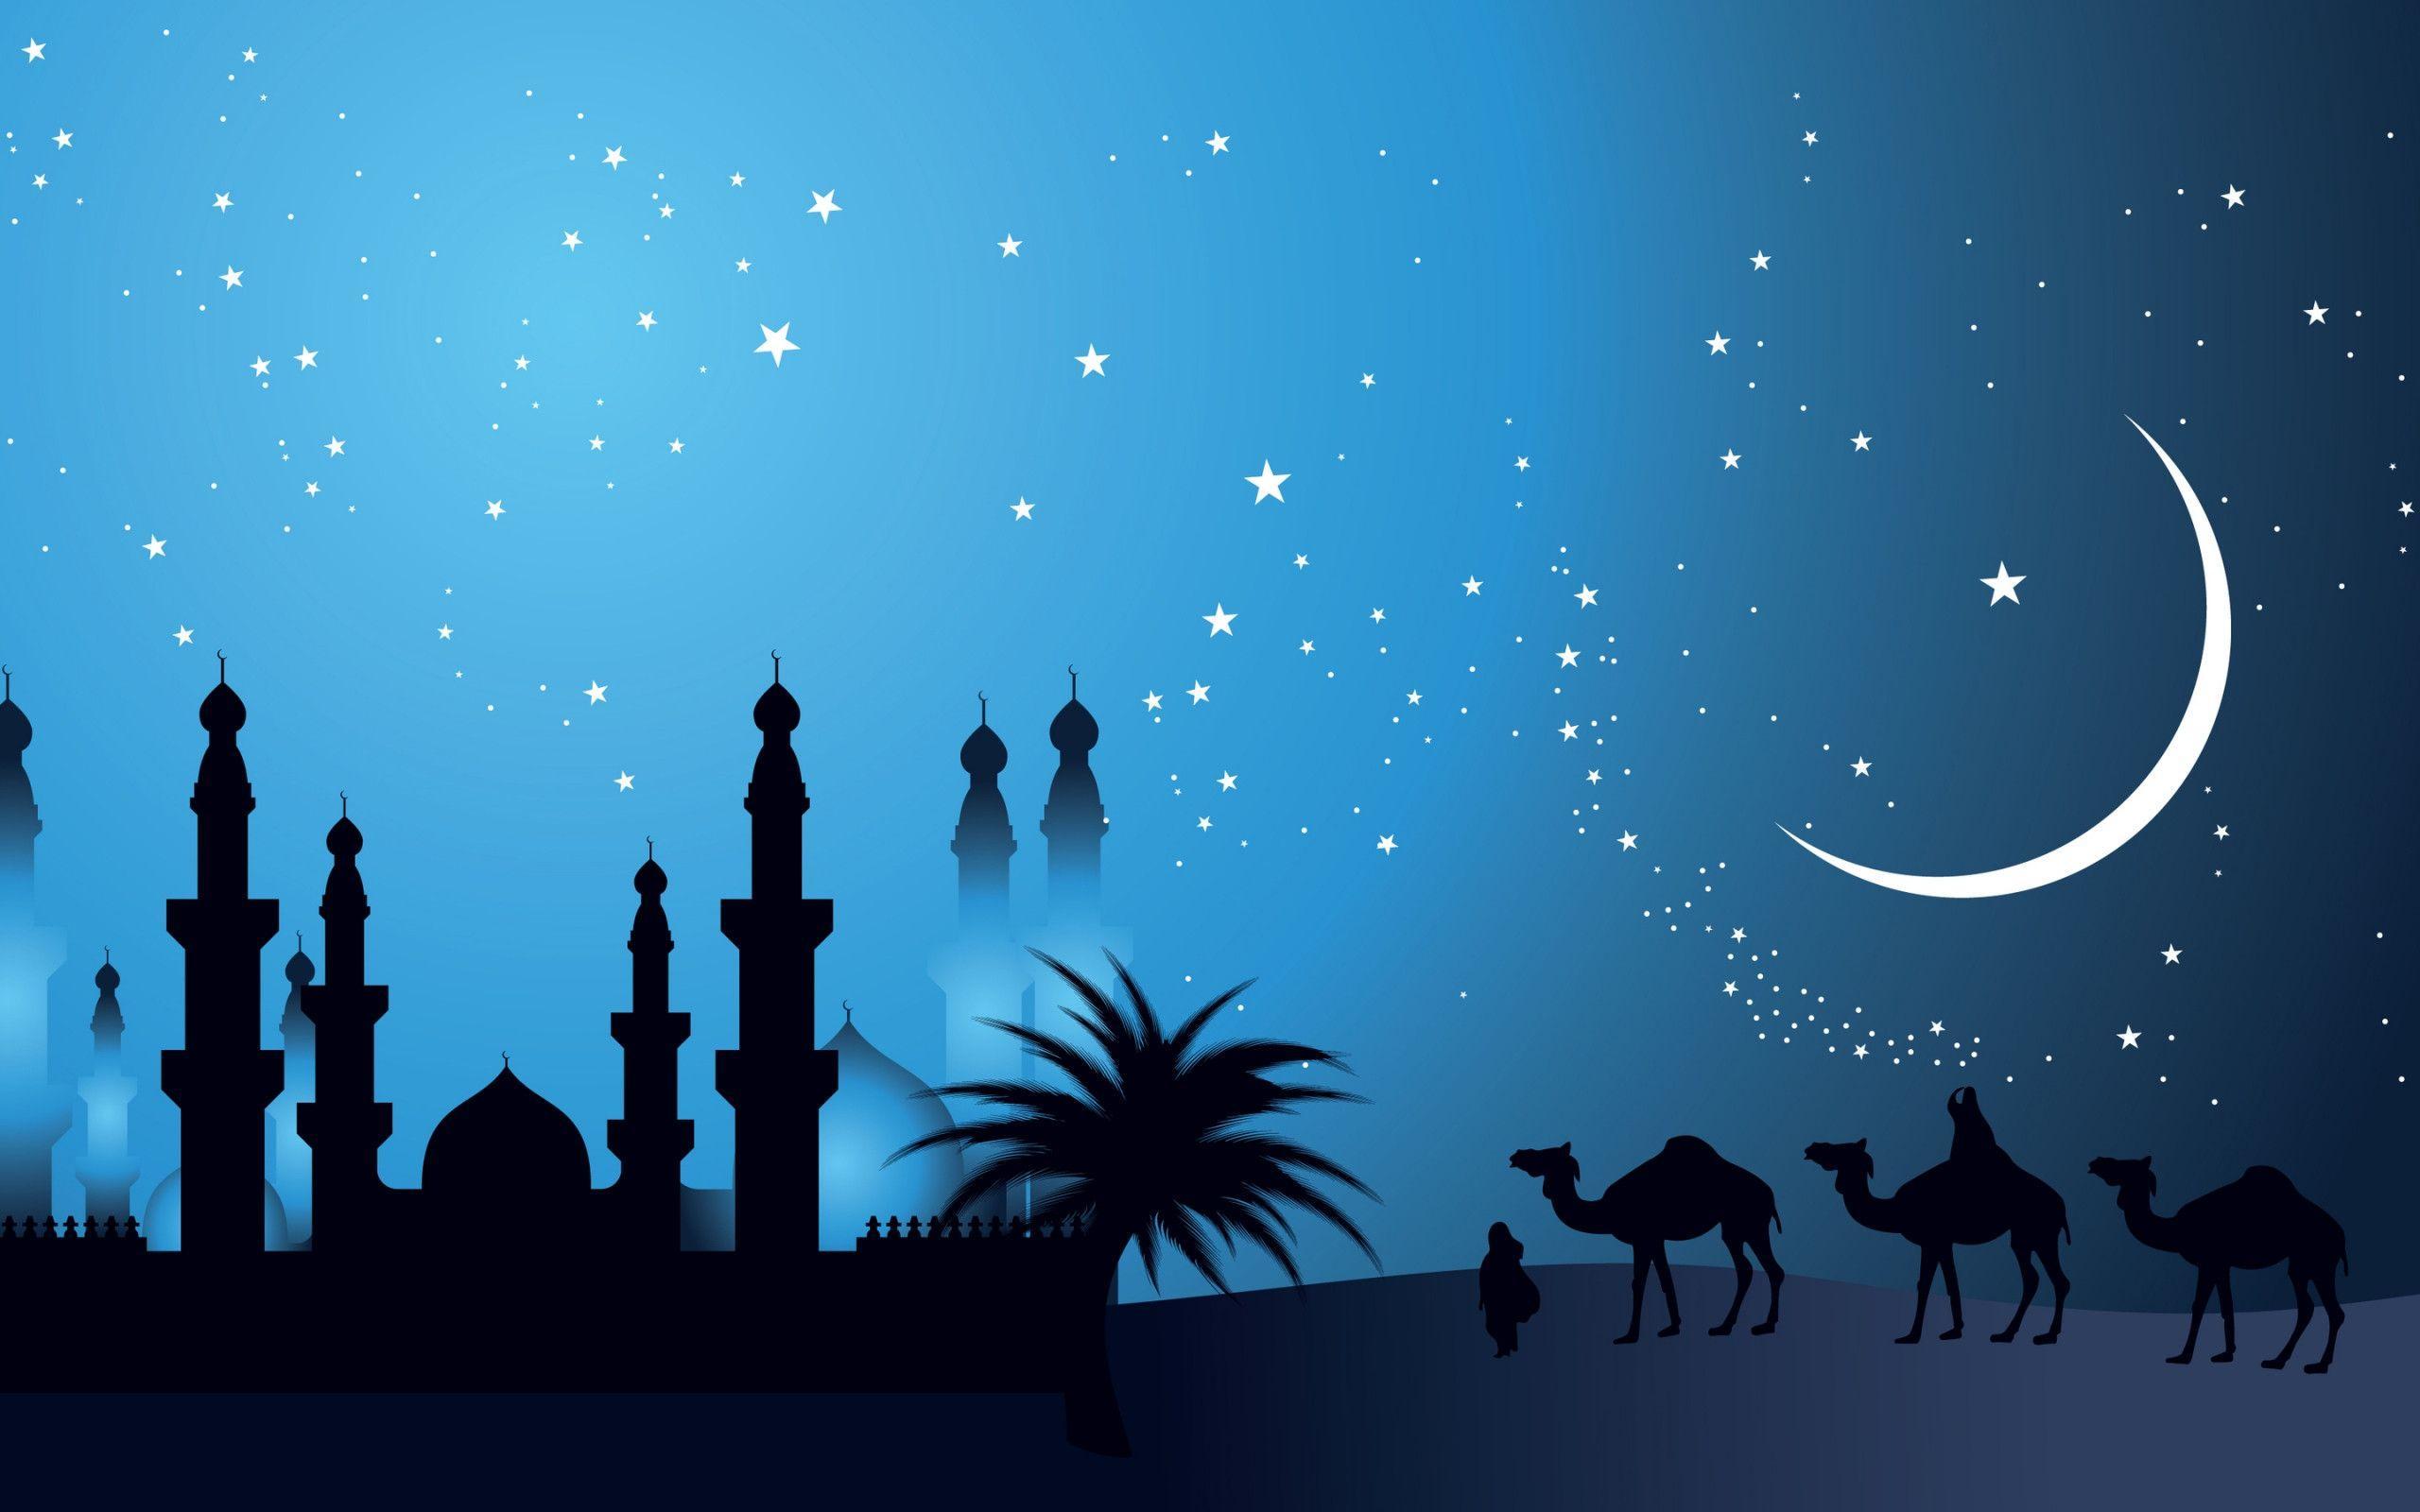 free Wallpapers Islamic